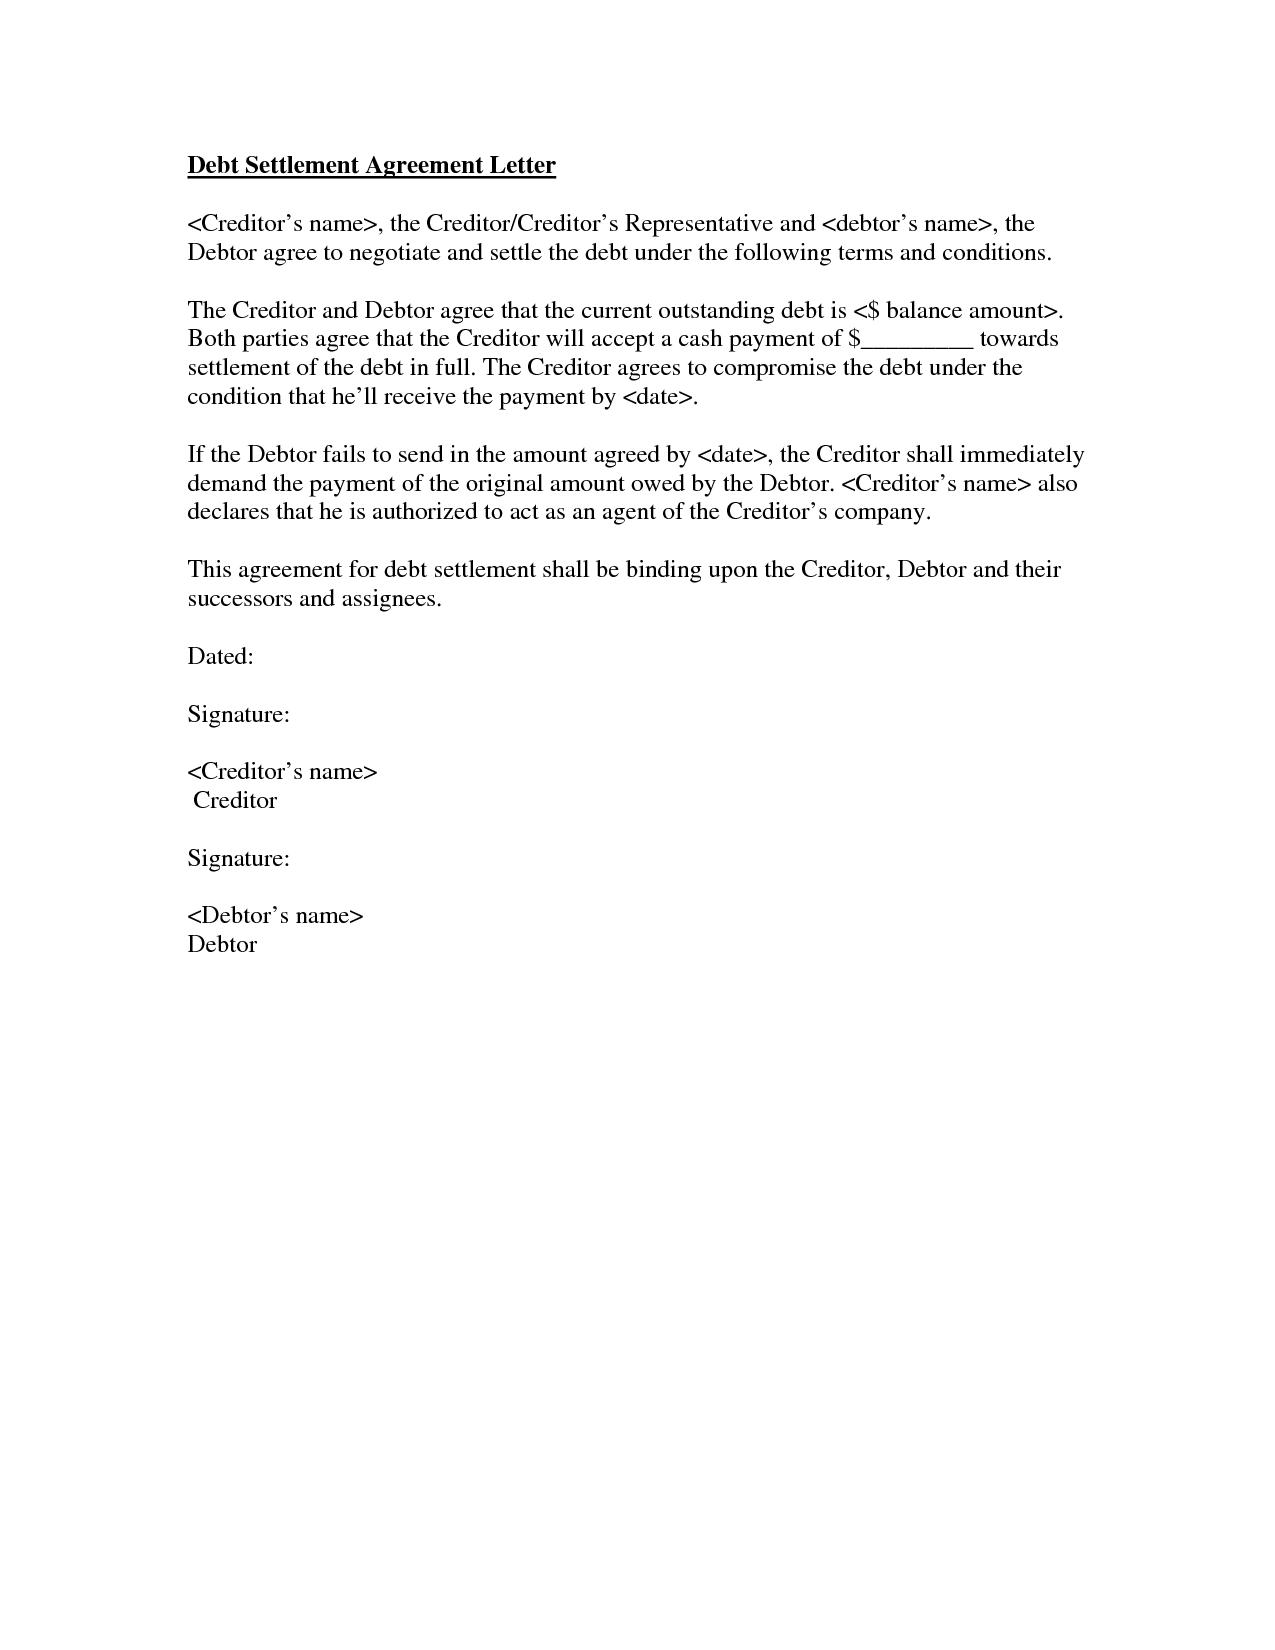 Debt Settlement Agreement Letter Template Collection Intended For Debt Settlement Agreement Letter Template